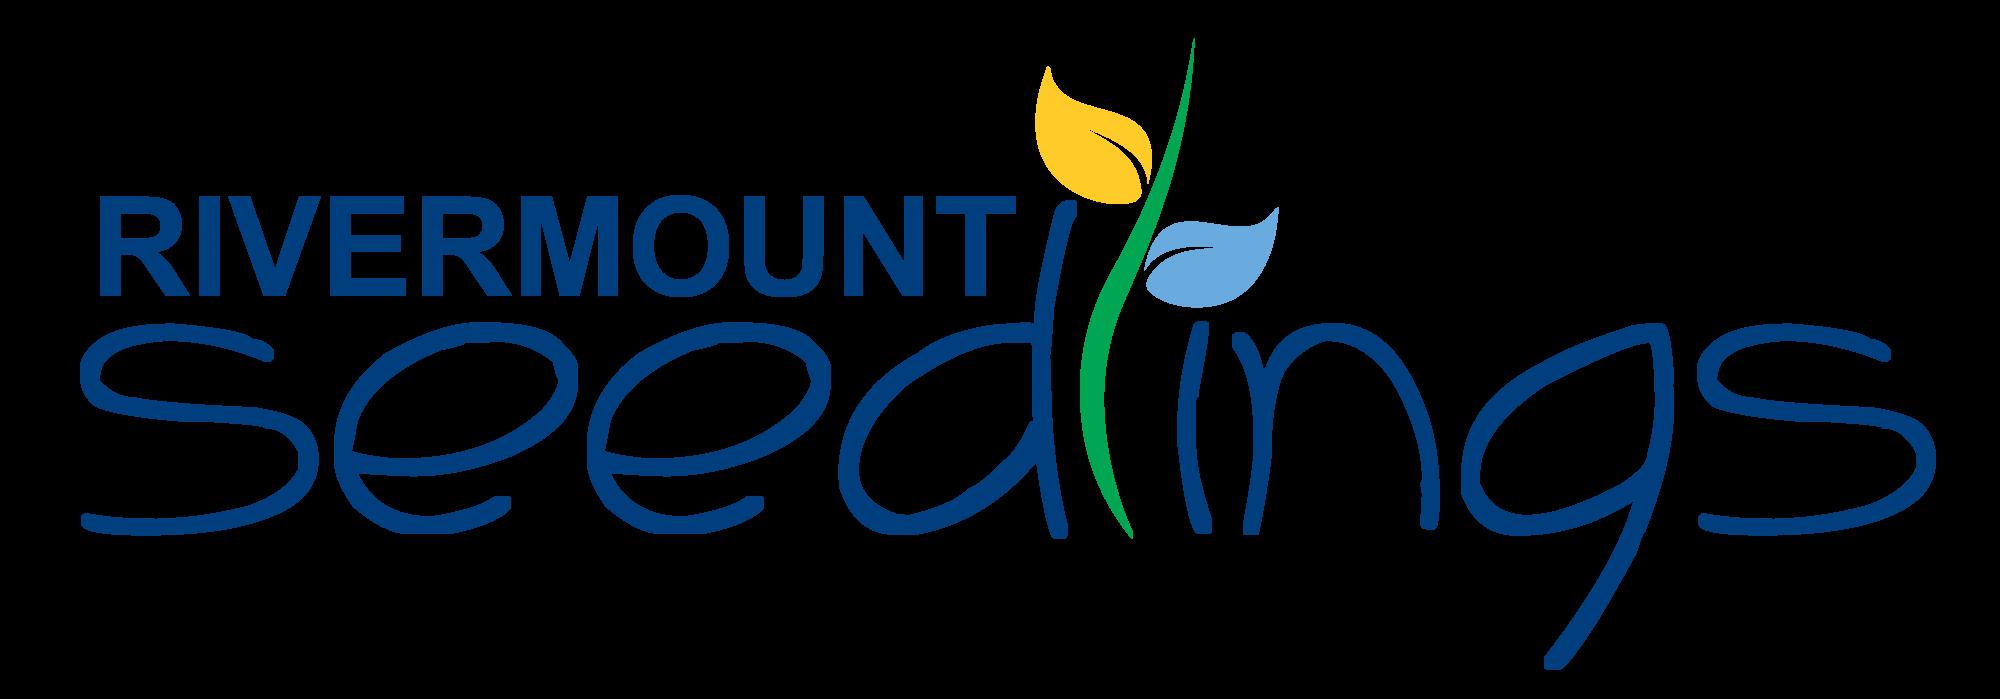 final-logo-RMC-SEEDLINGS.png?mtime=20200514152602#asset:3890